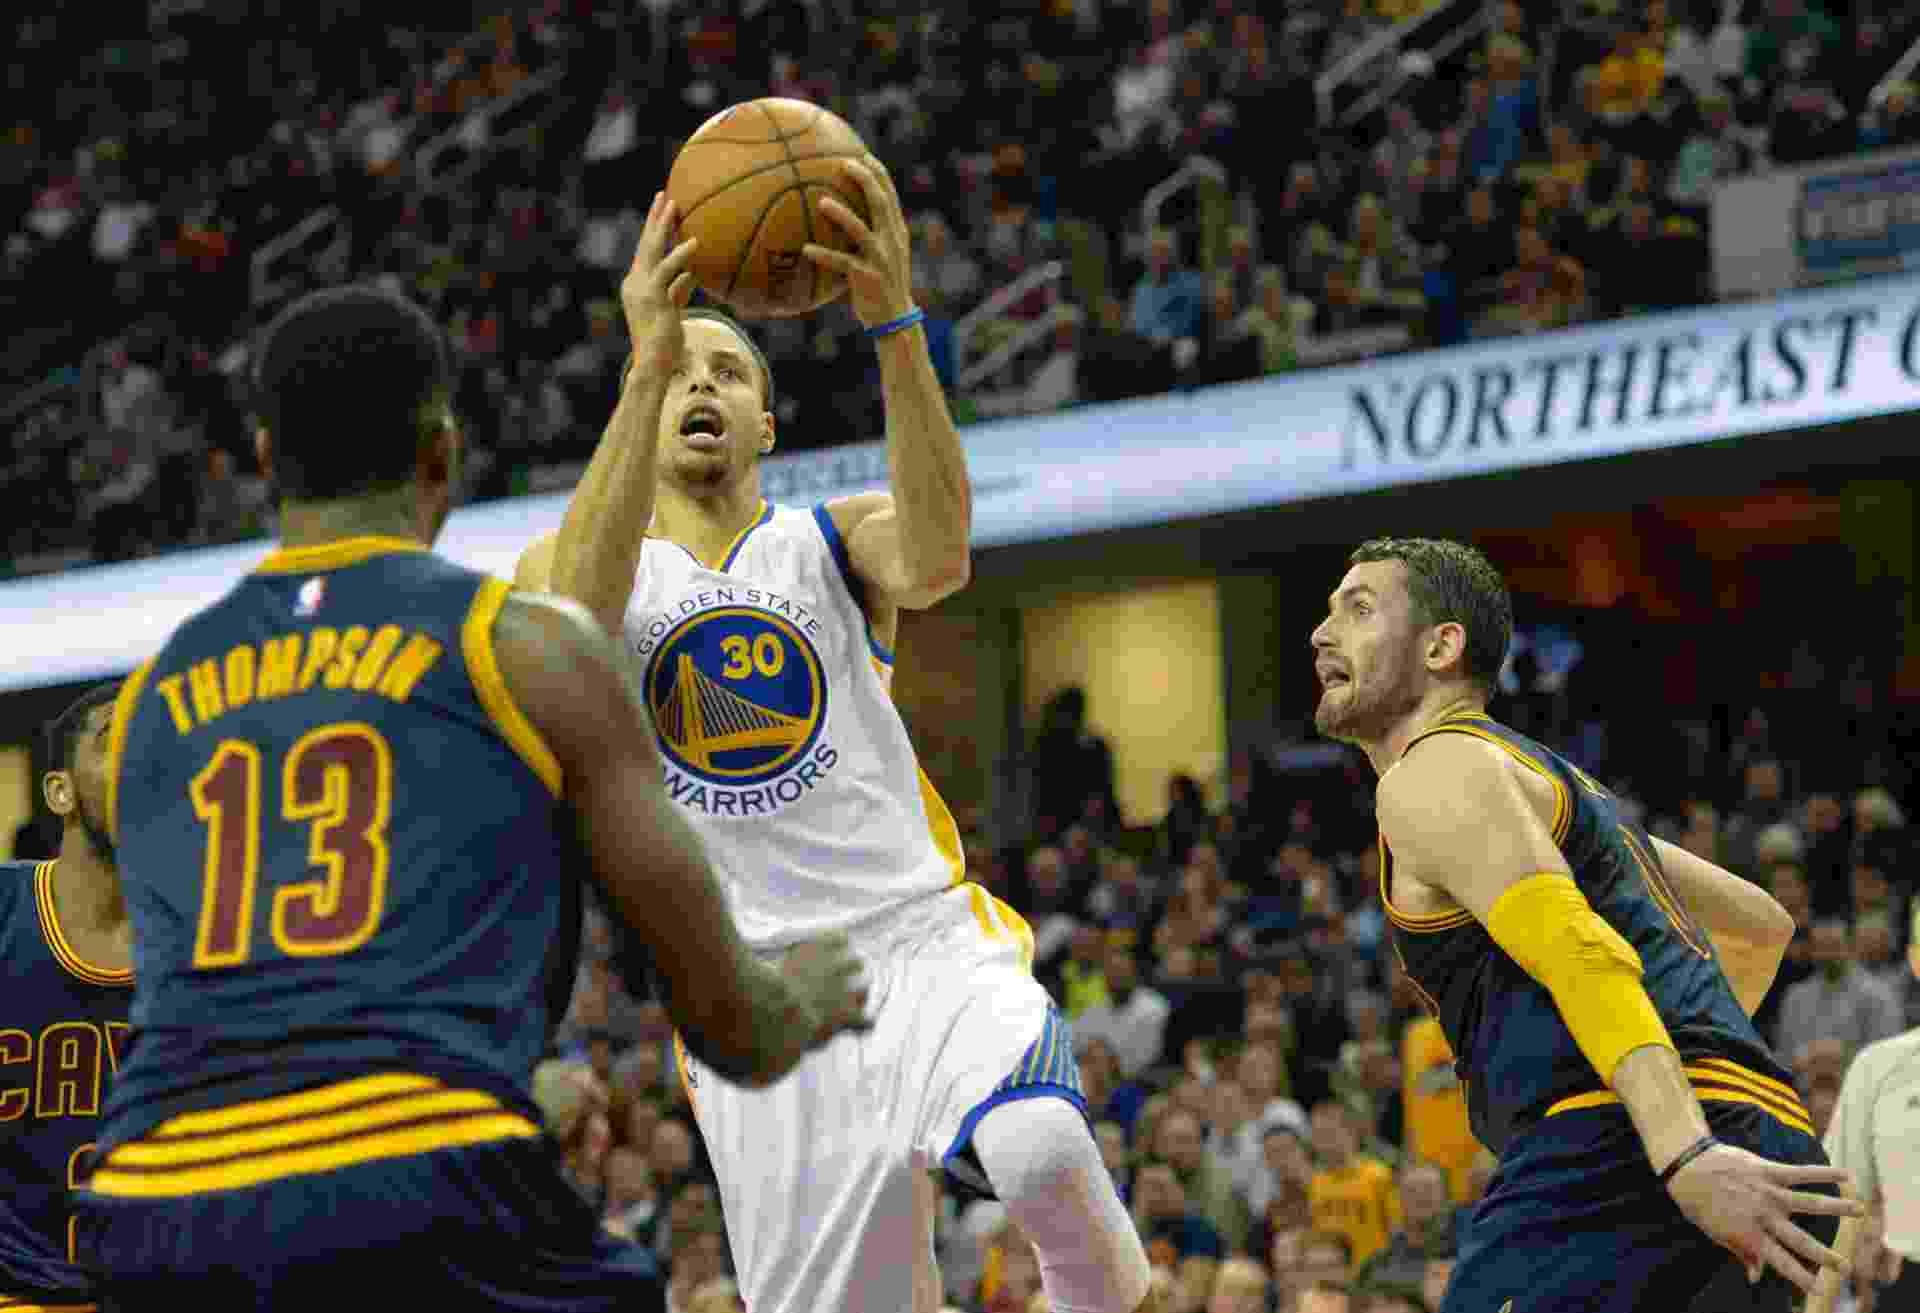 4e59eb24b Fotos  Rodada da NBA - 26 02 15 - 27 02 2015 - UOL Esporte